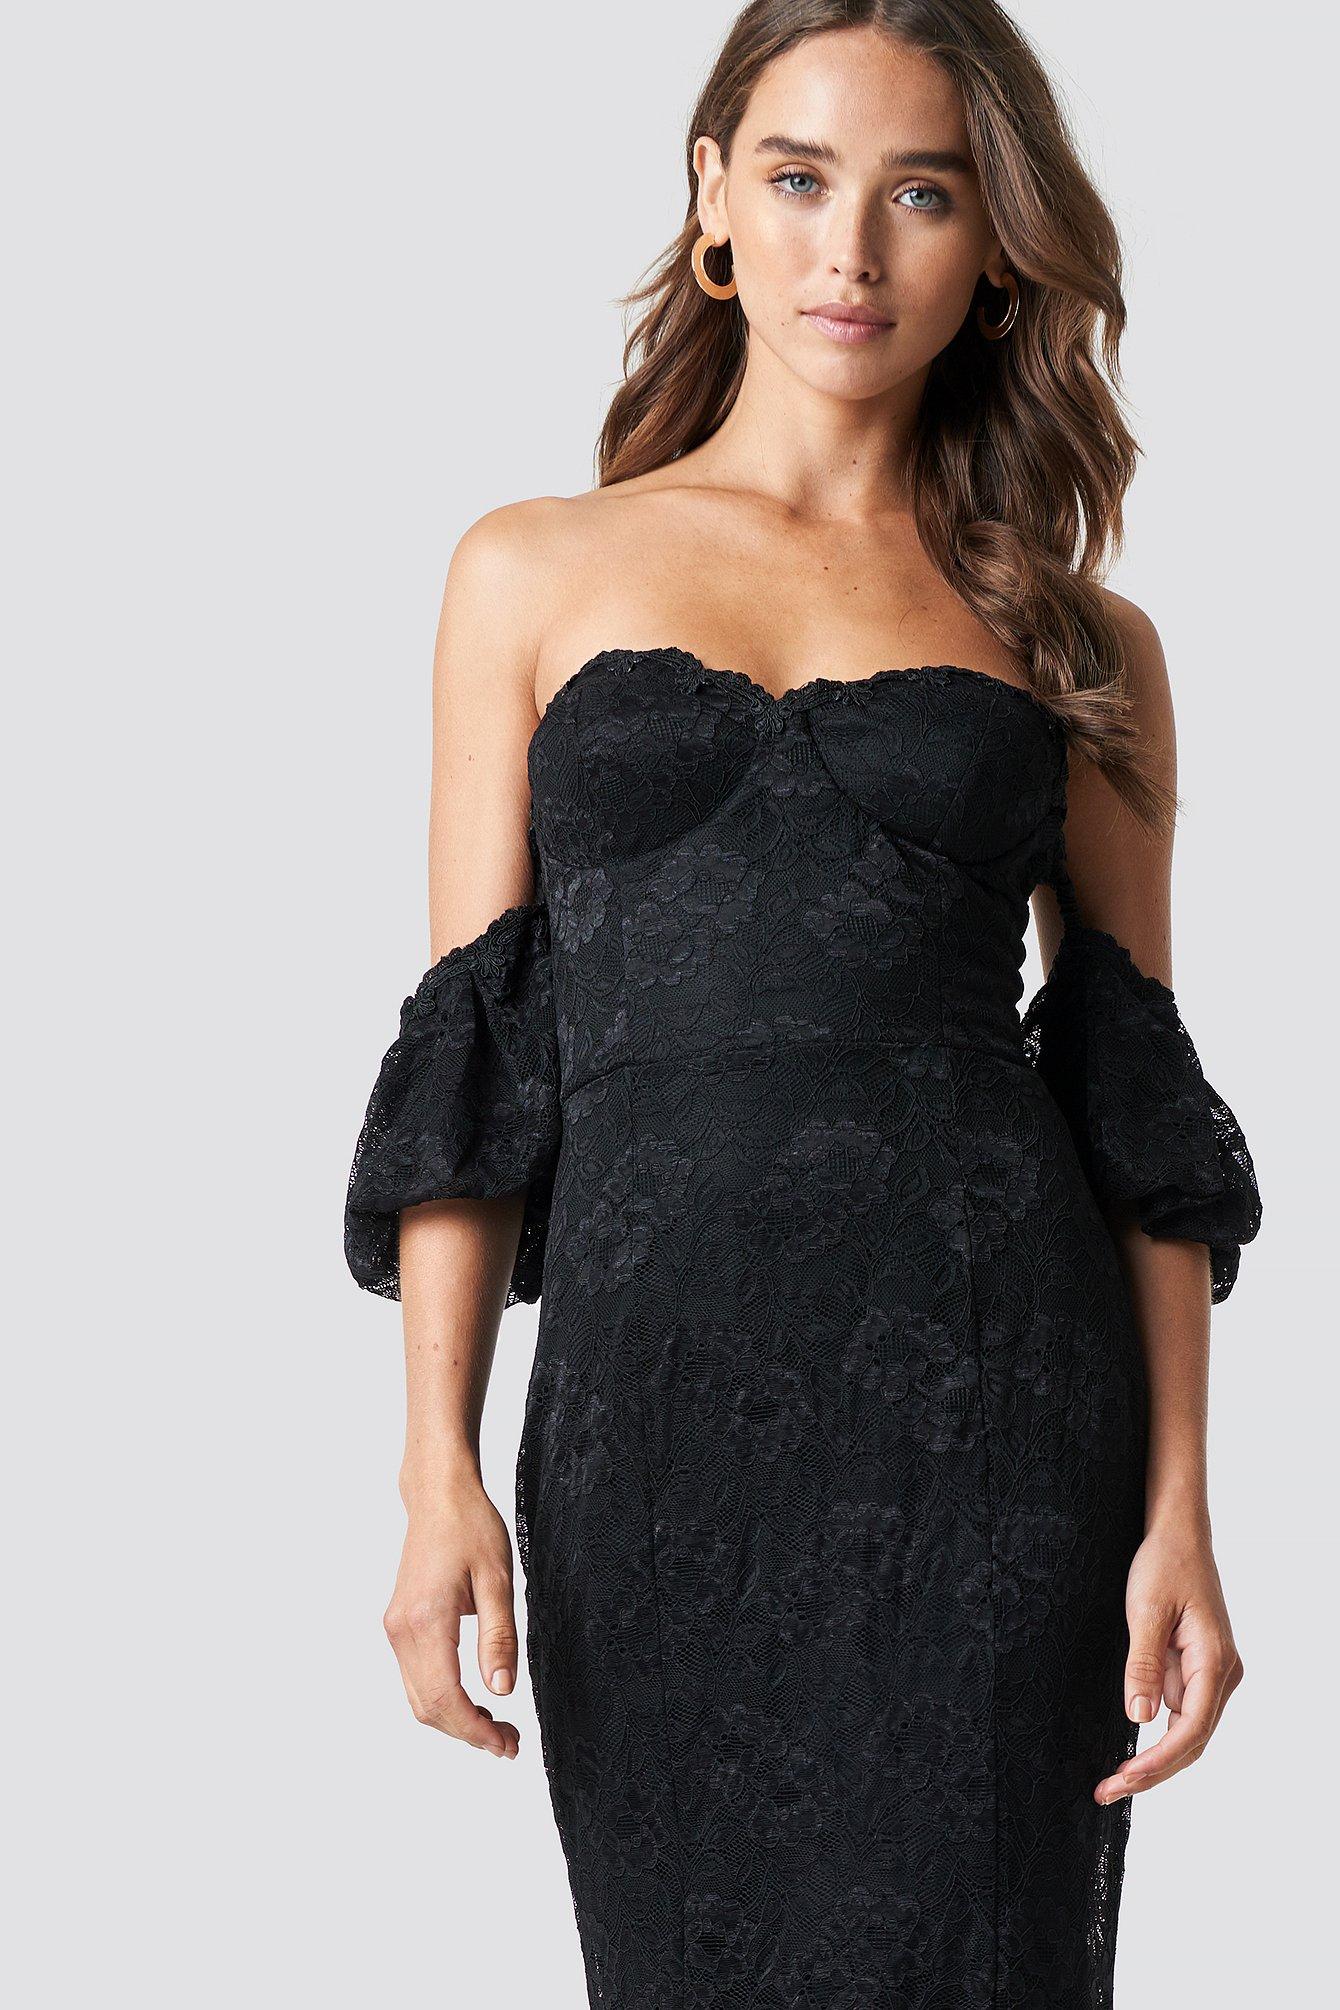 TRENDYOL CARMEN LACE MAXI DRESS - BLACK